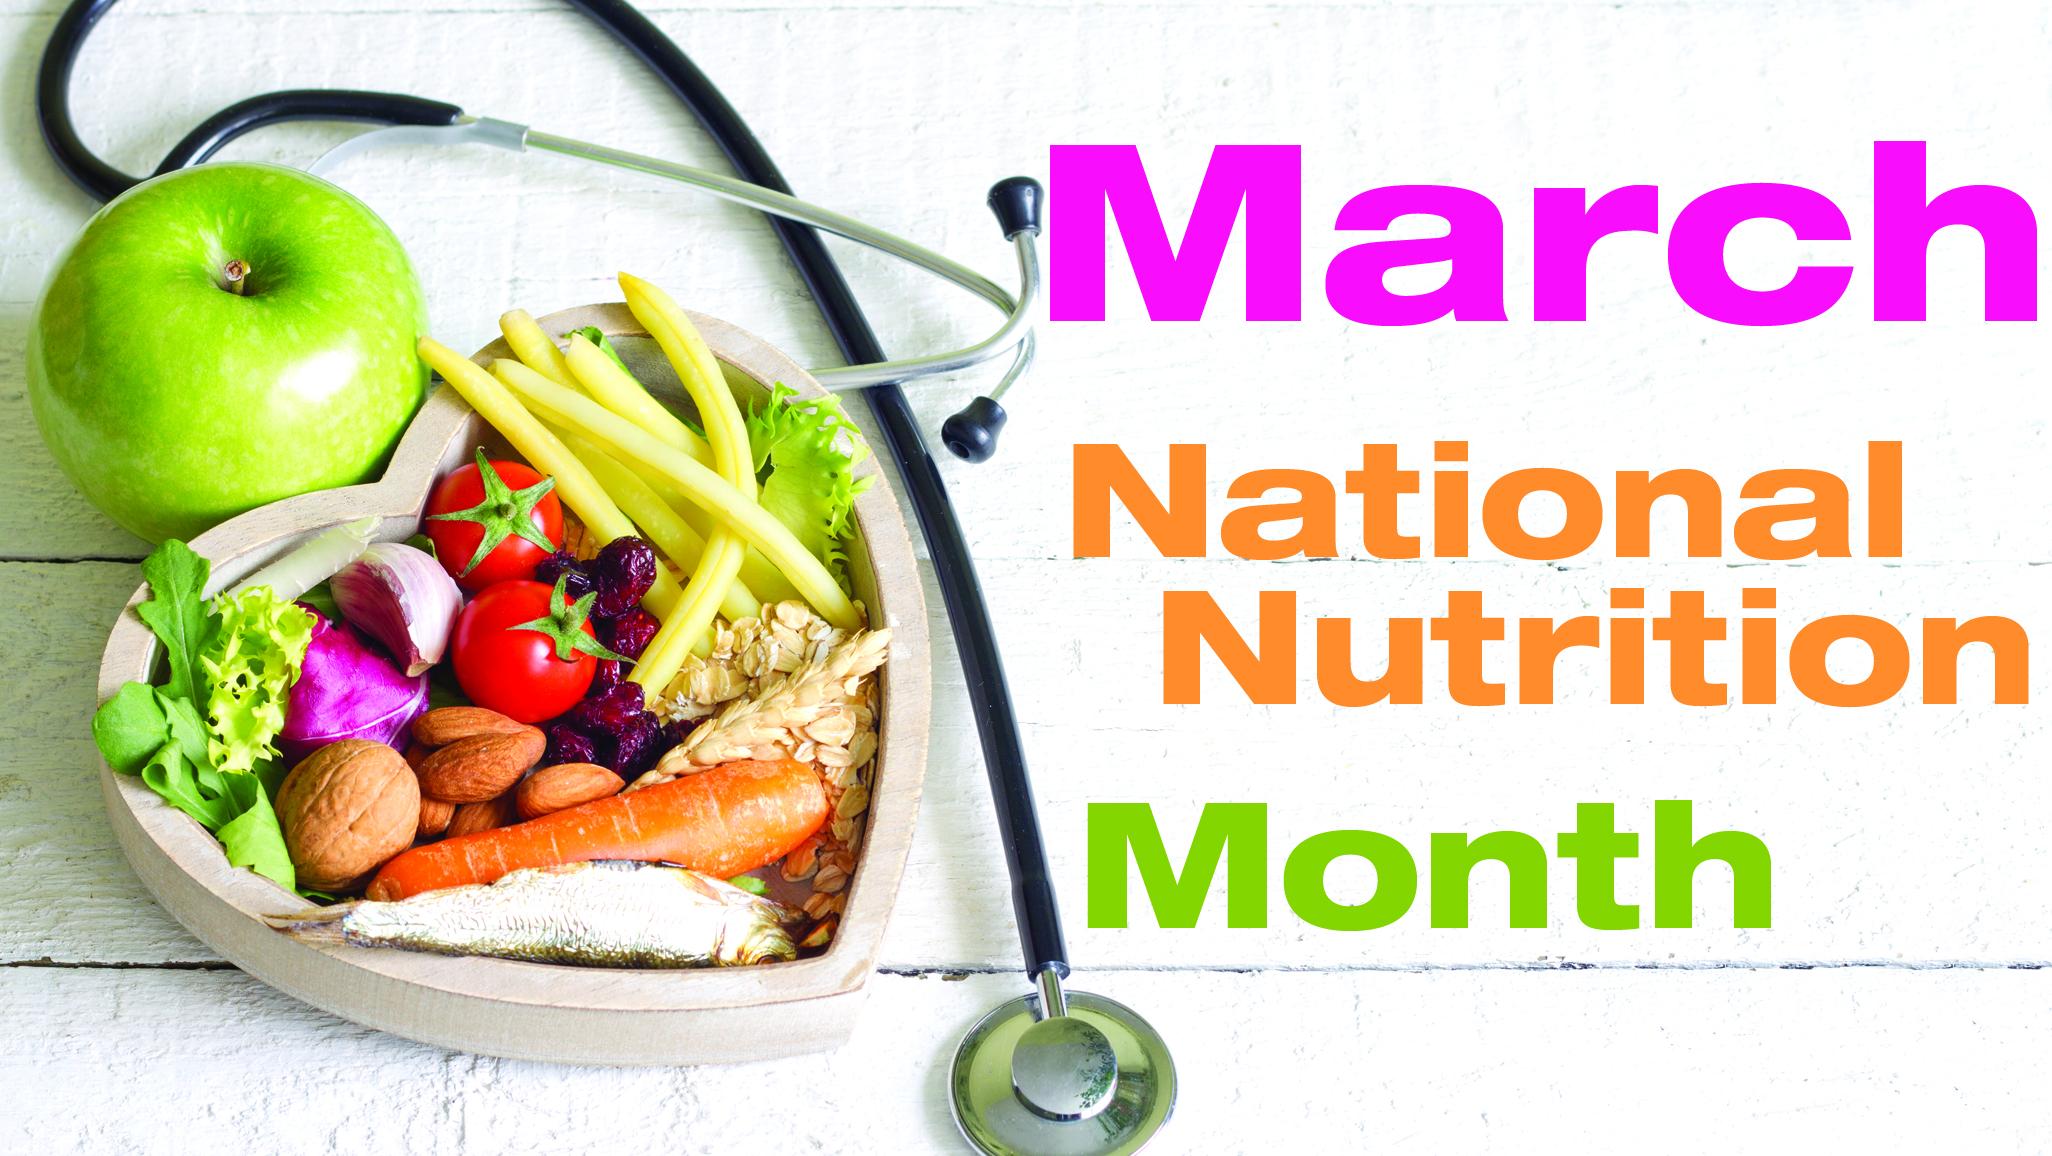 National Nutrition Month Eating Smarter